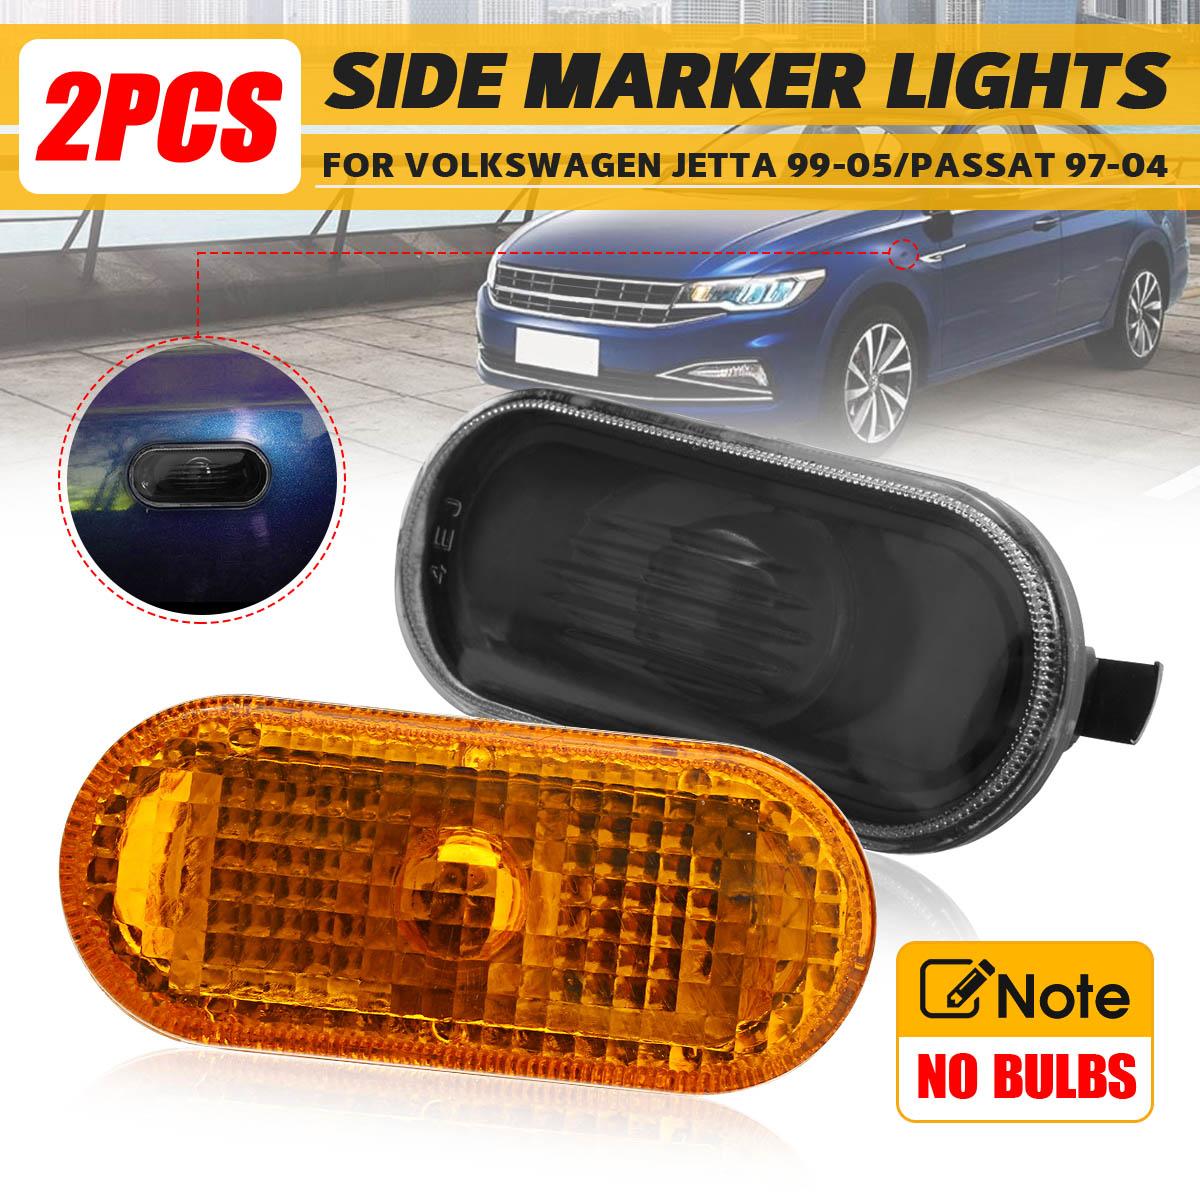 Lámpara de señal para coche, 2 uds., luces con indicador lateral ámbar para Volkswagen Golf Jetta MK4 1999-2005 para Passat B5/B5.5 1997 1998-2004 con Sin bombilla